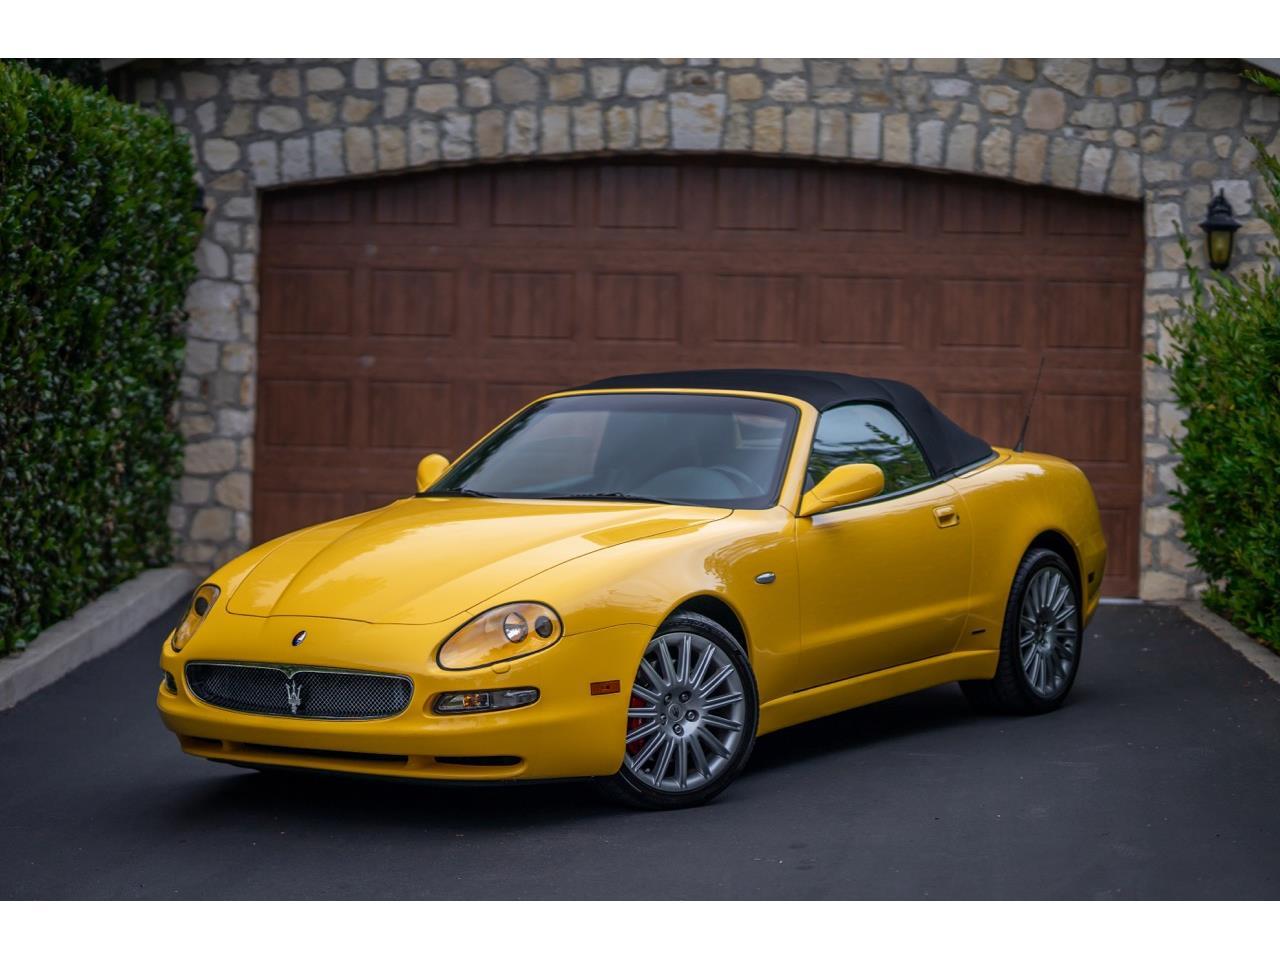 2002 Maserati Spyder for Sale   ClassicCars.com   CC-1234246